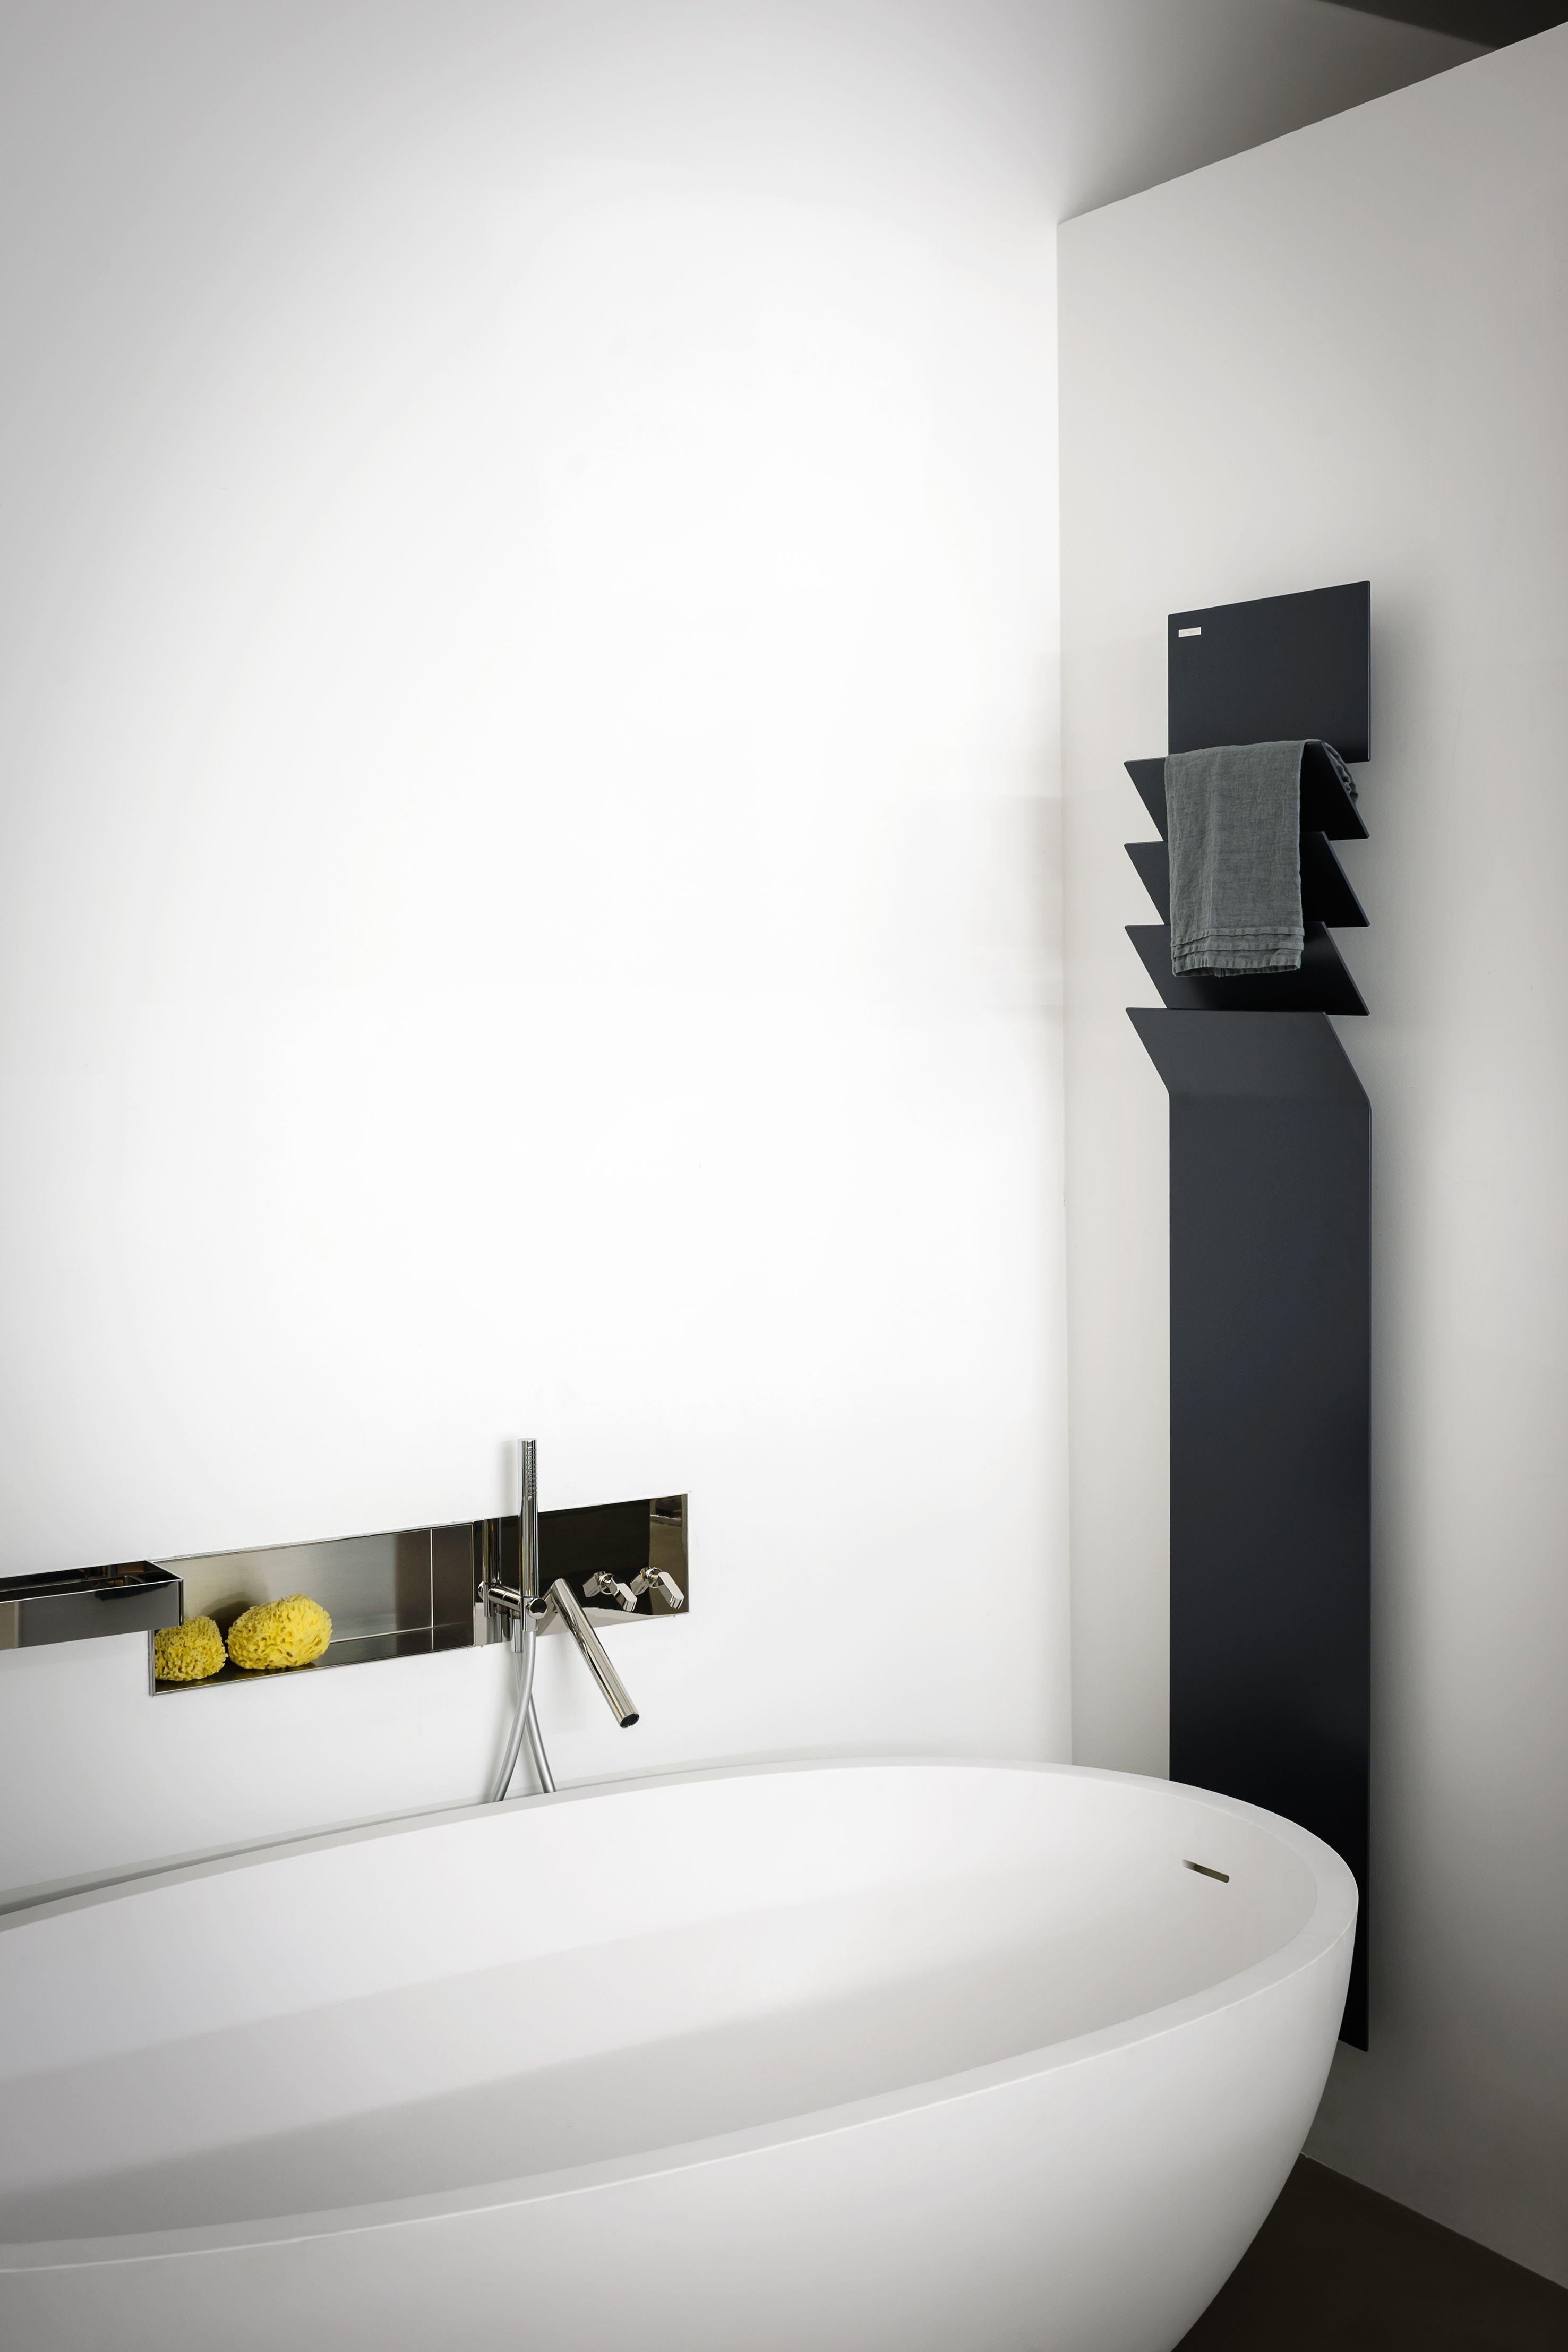 Explore Towel Warmer, Bath Room, And More!